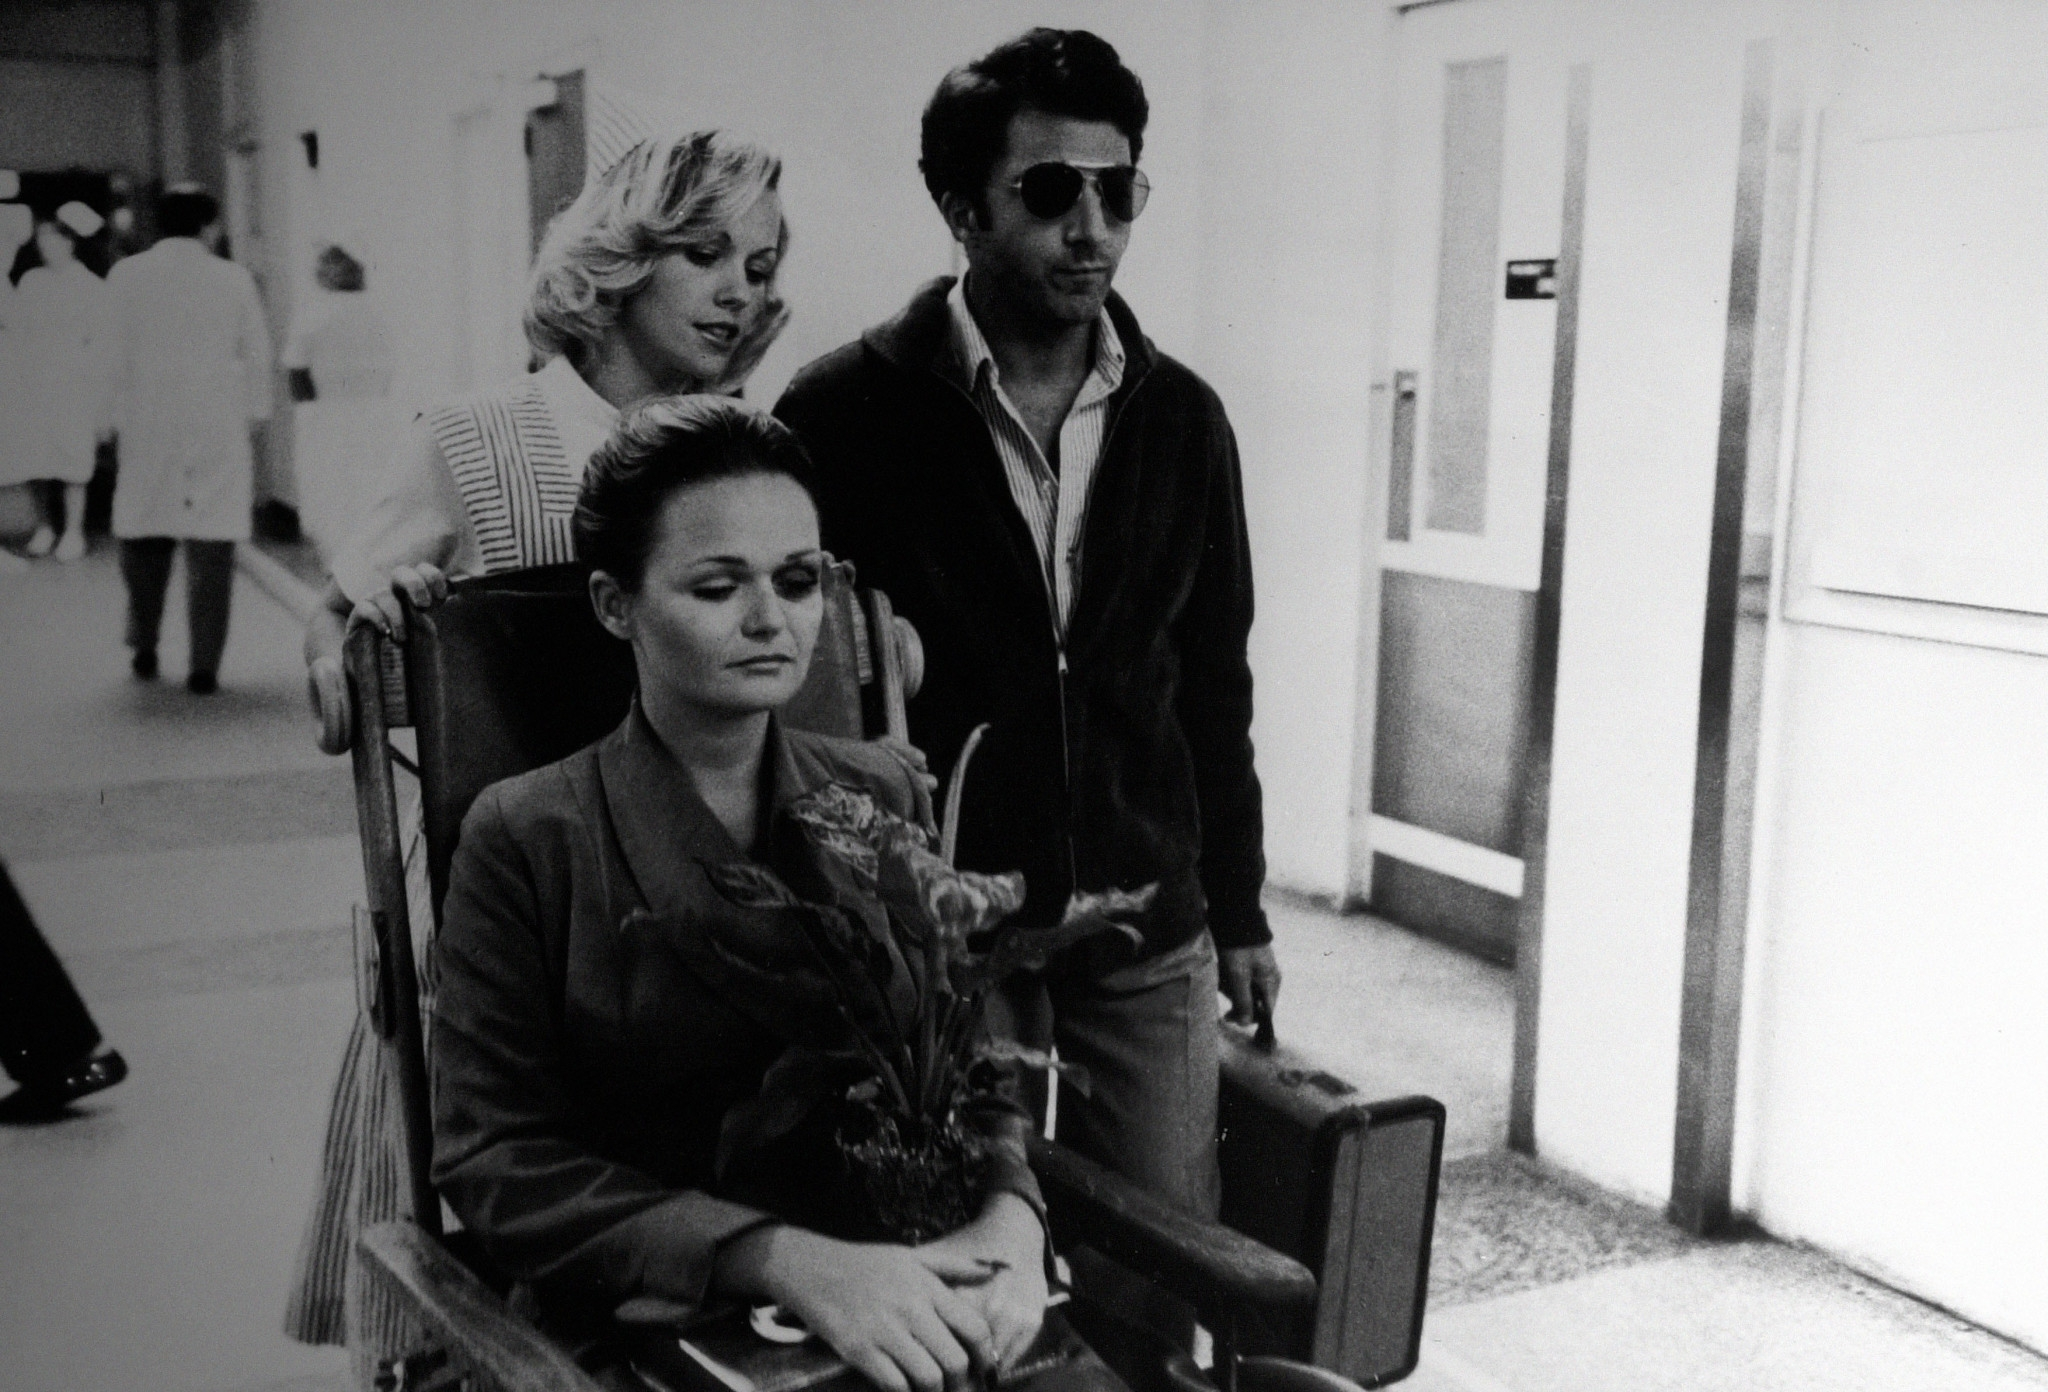 Dustin Hofmann v dráme Lenny, 1974